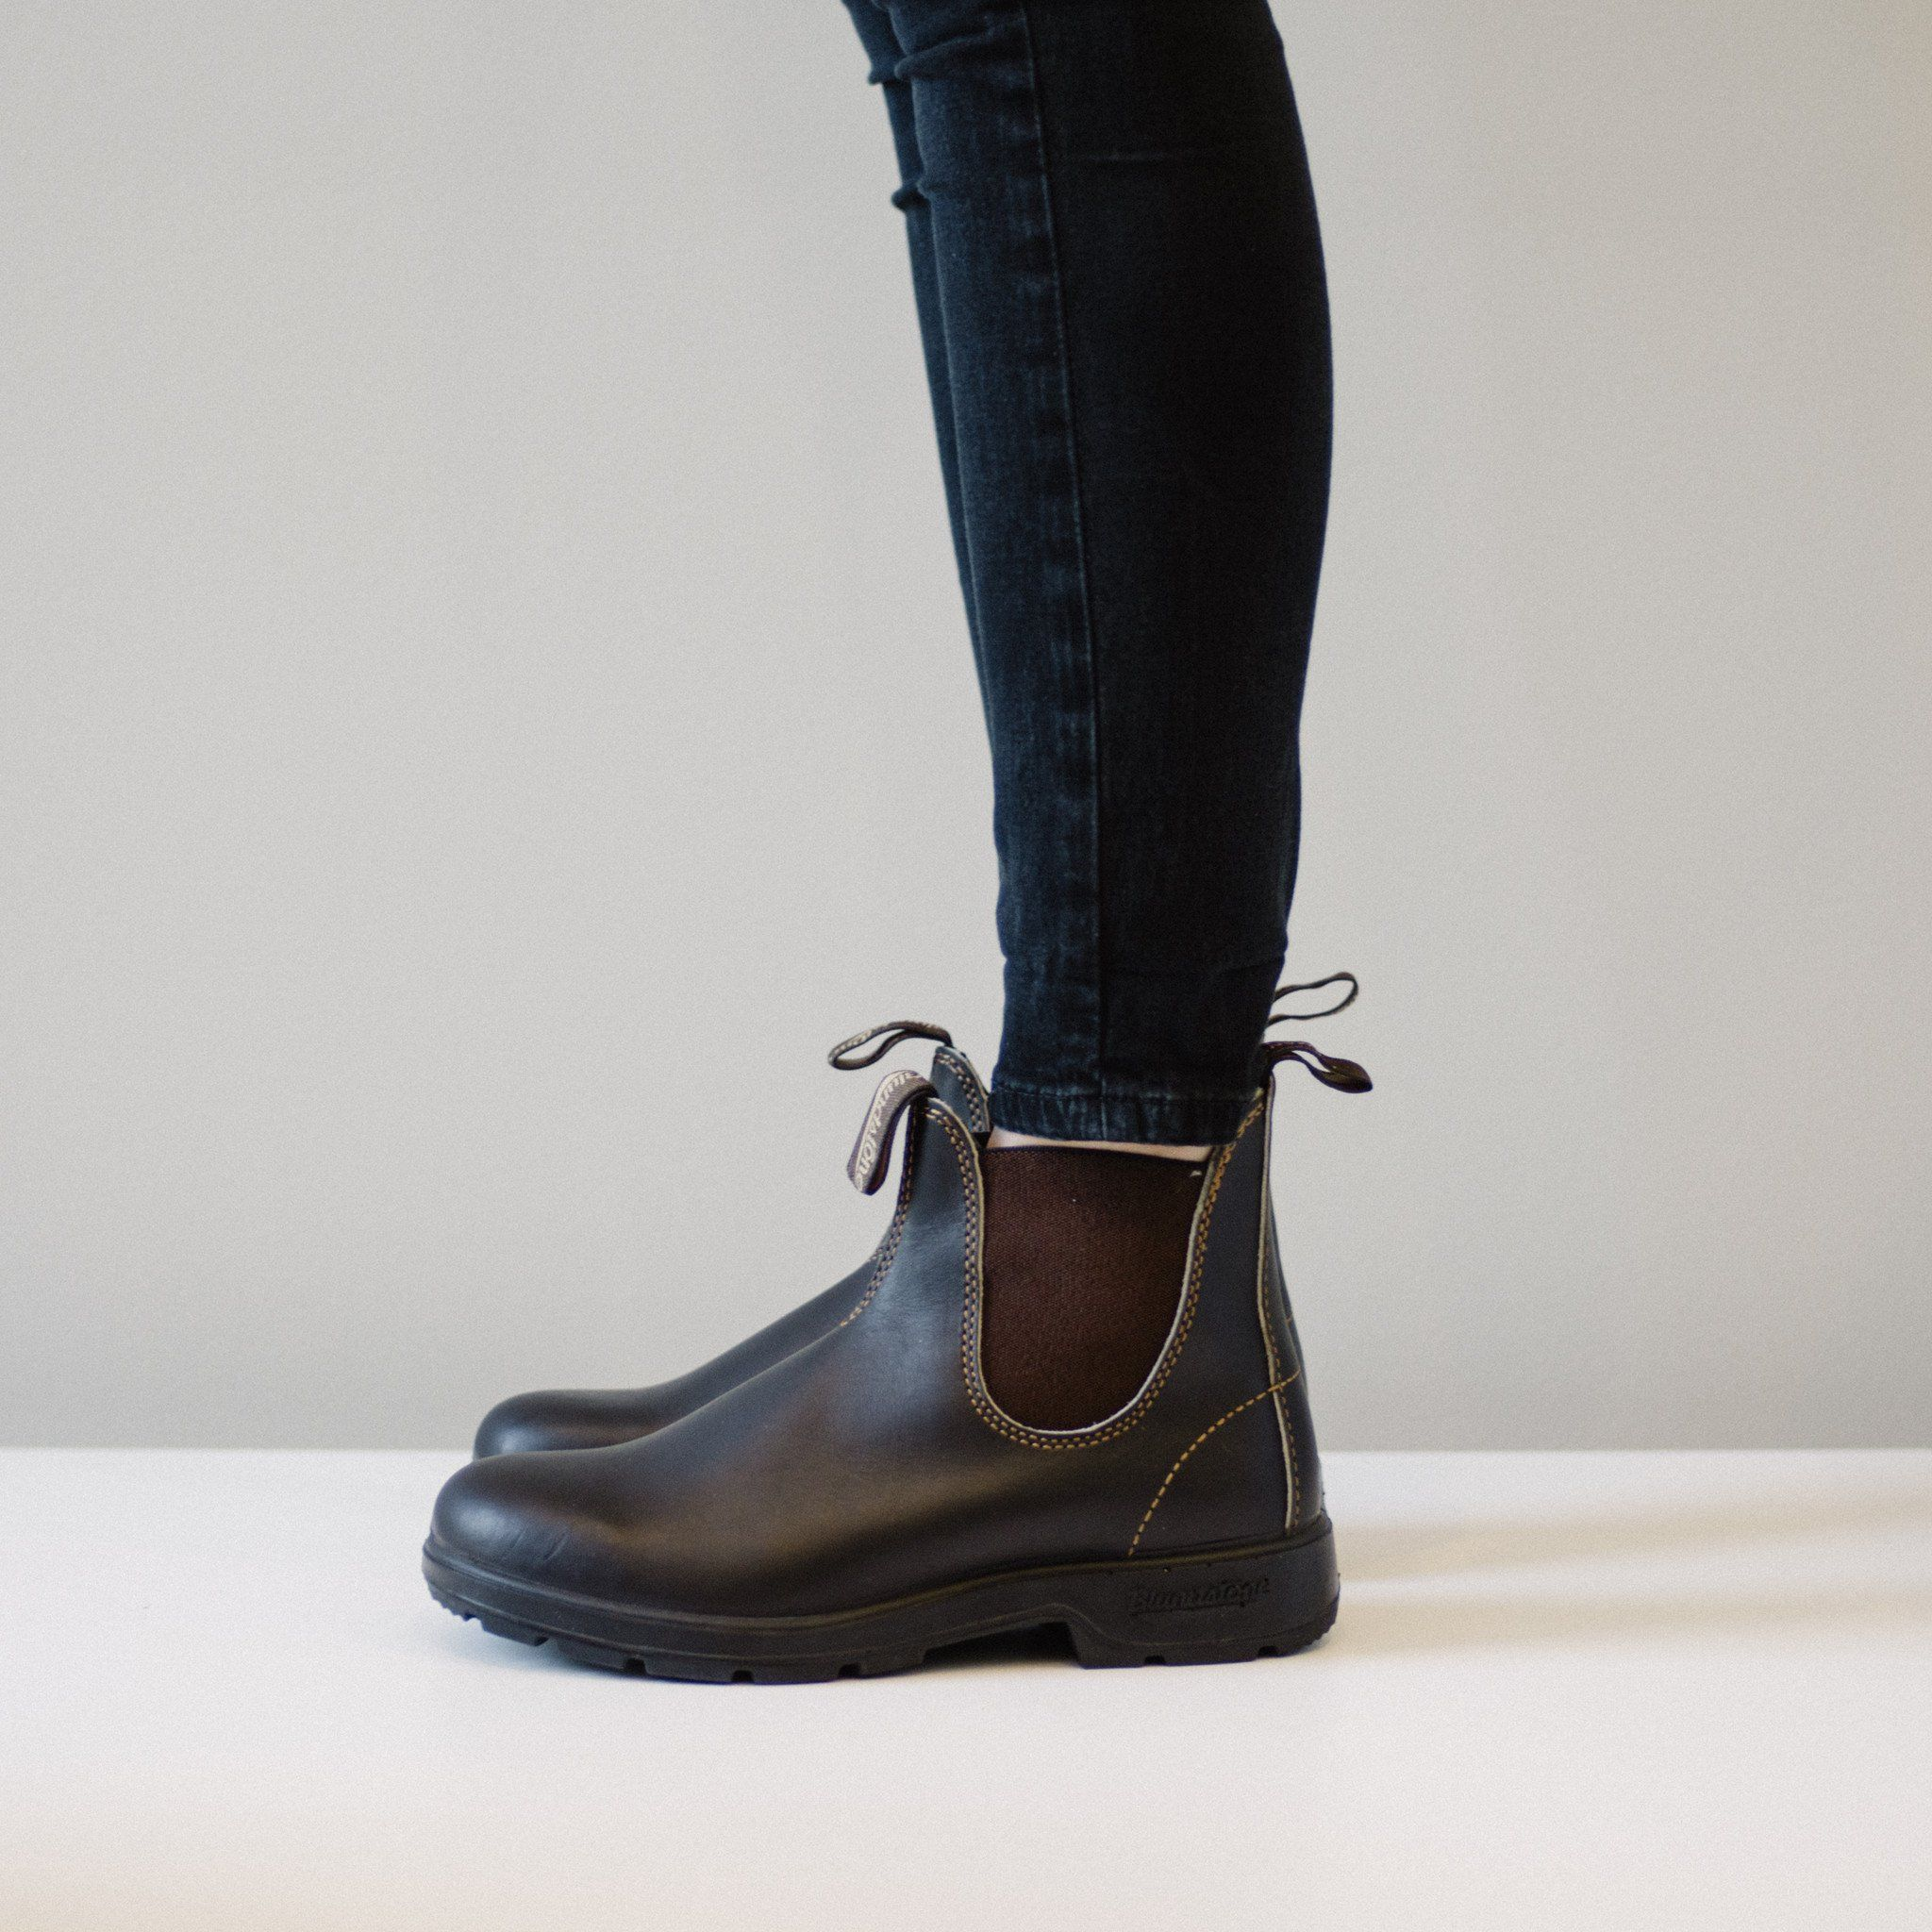 Blundstone original #500 | Blundstone boots women